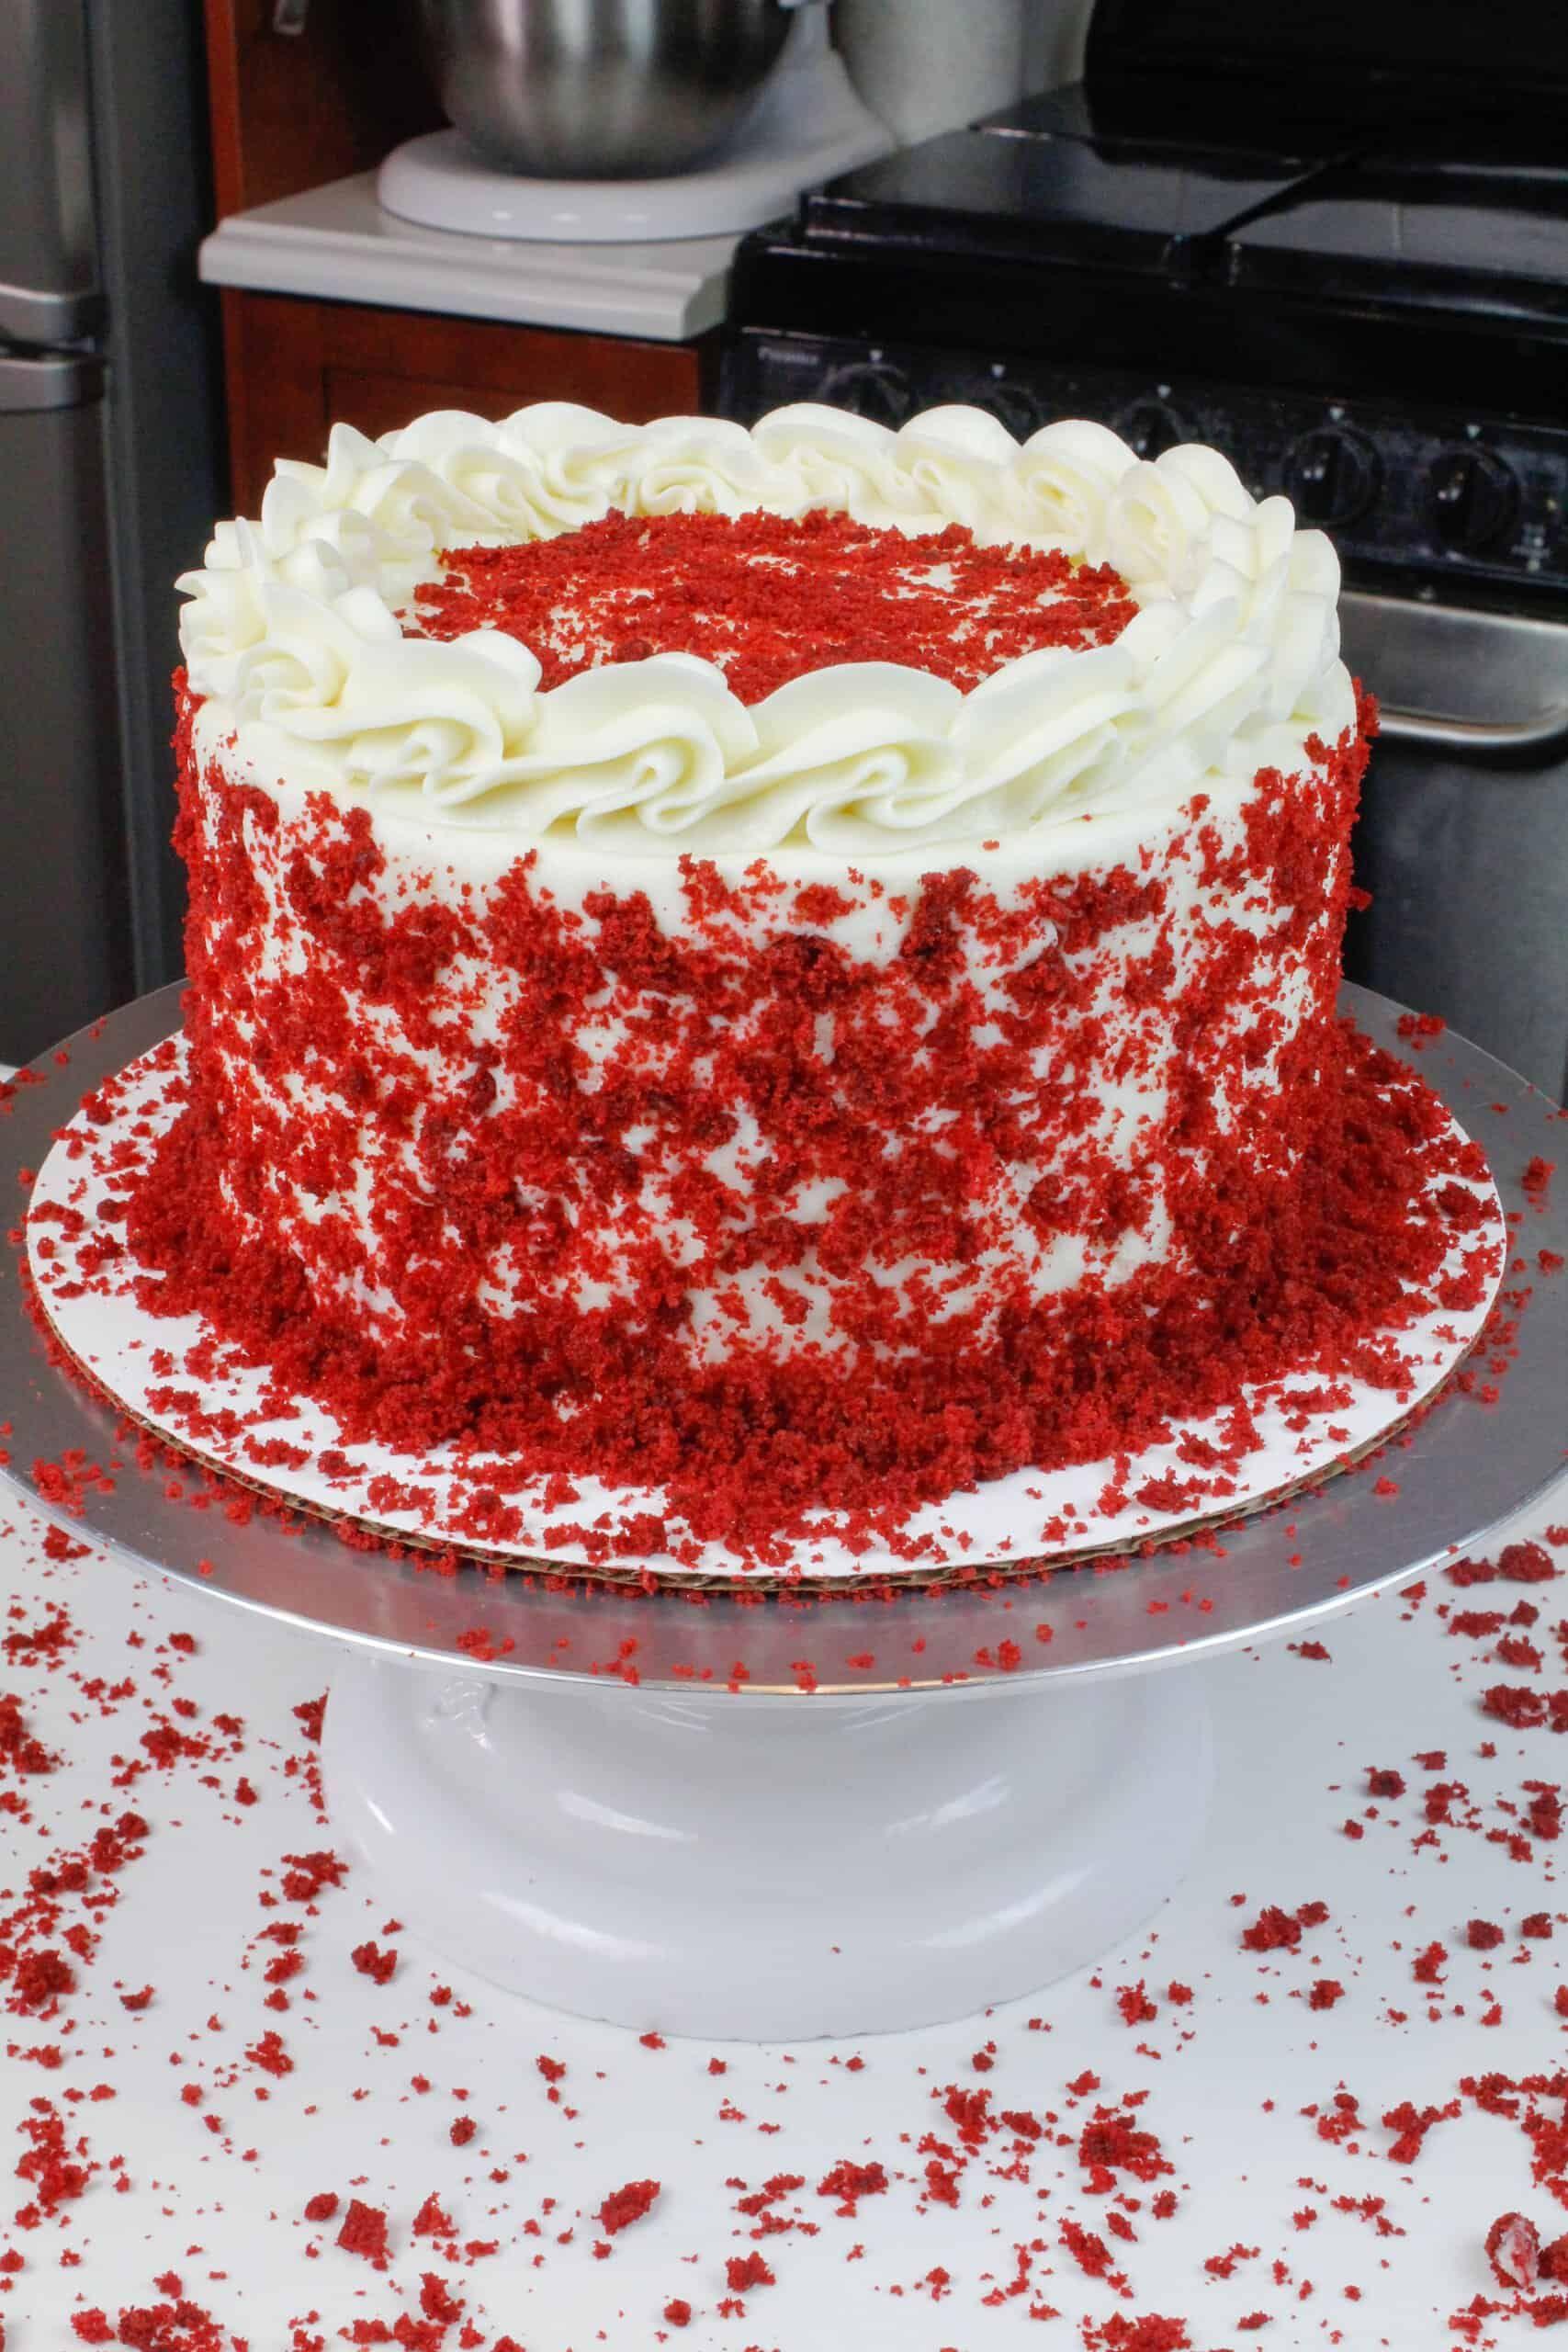 Red Velvet Layer Cake With Cream Cheese Frosting Recipe In 2020 Velvet Cake Recipes Red Velvet Cake Recipe Cake With Cream Cheese